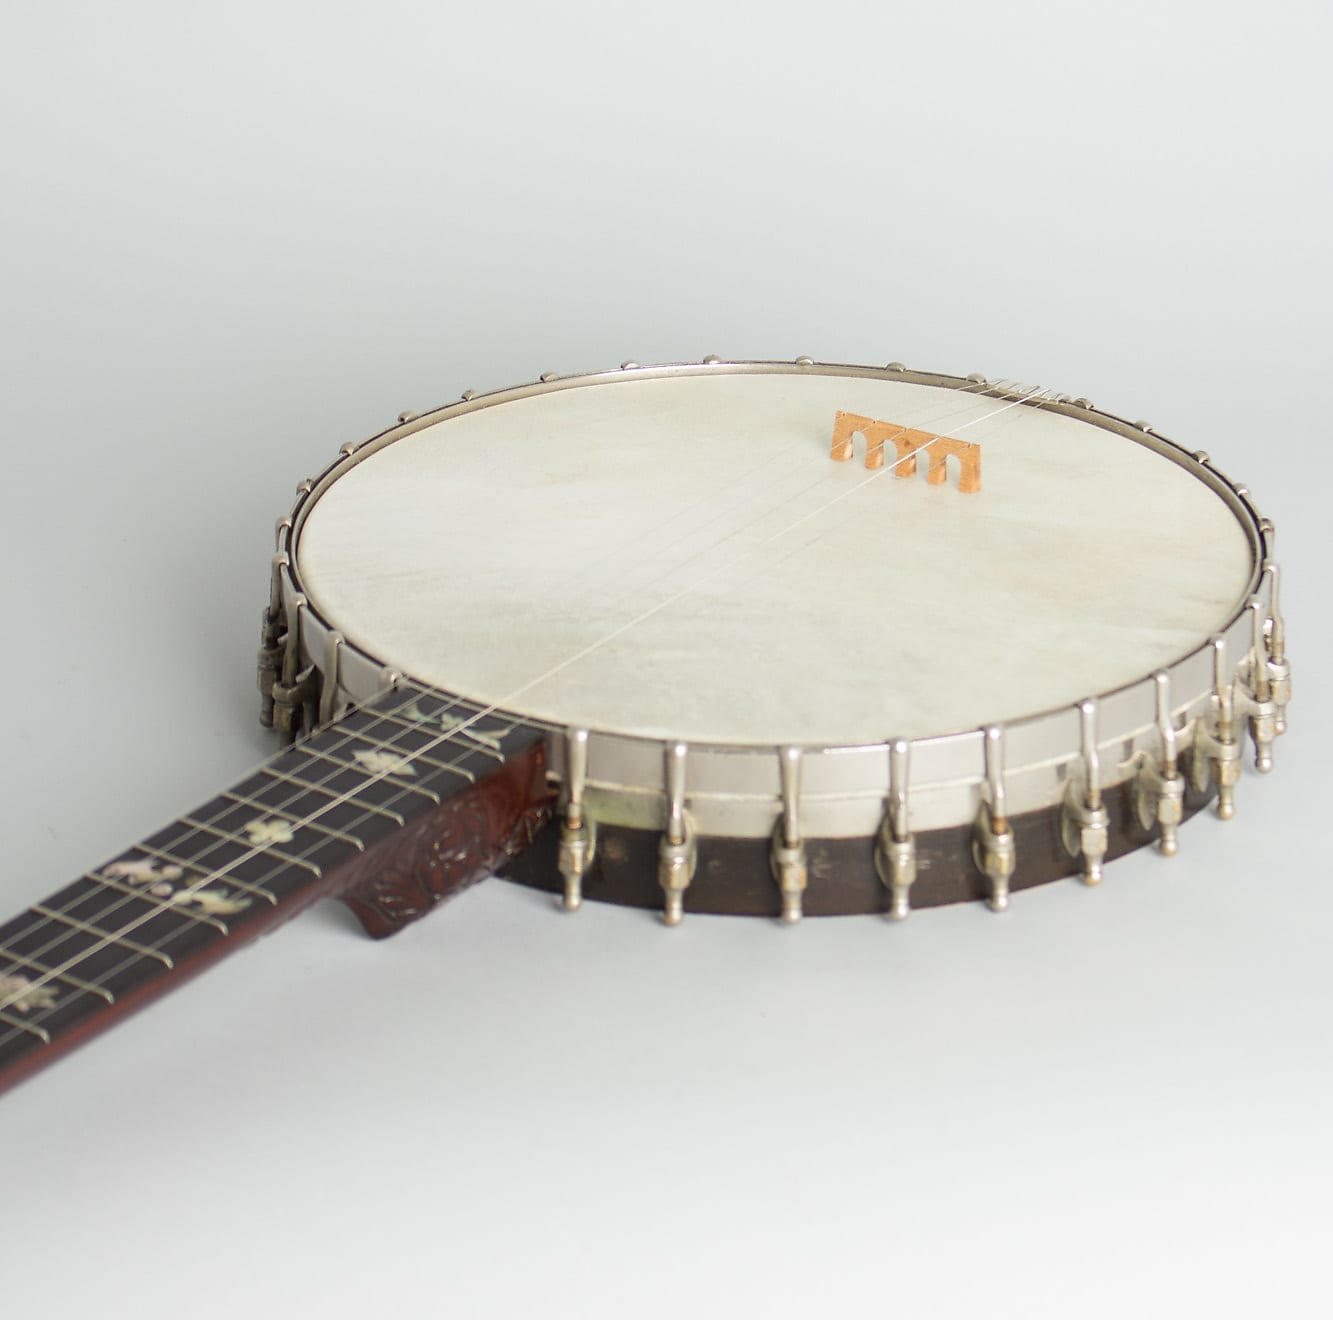 W. A. Cole  Eclipse Custom 5 String Banjo (1893), ser. #904, black hard shell case.